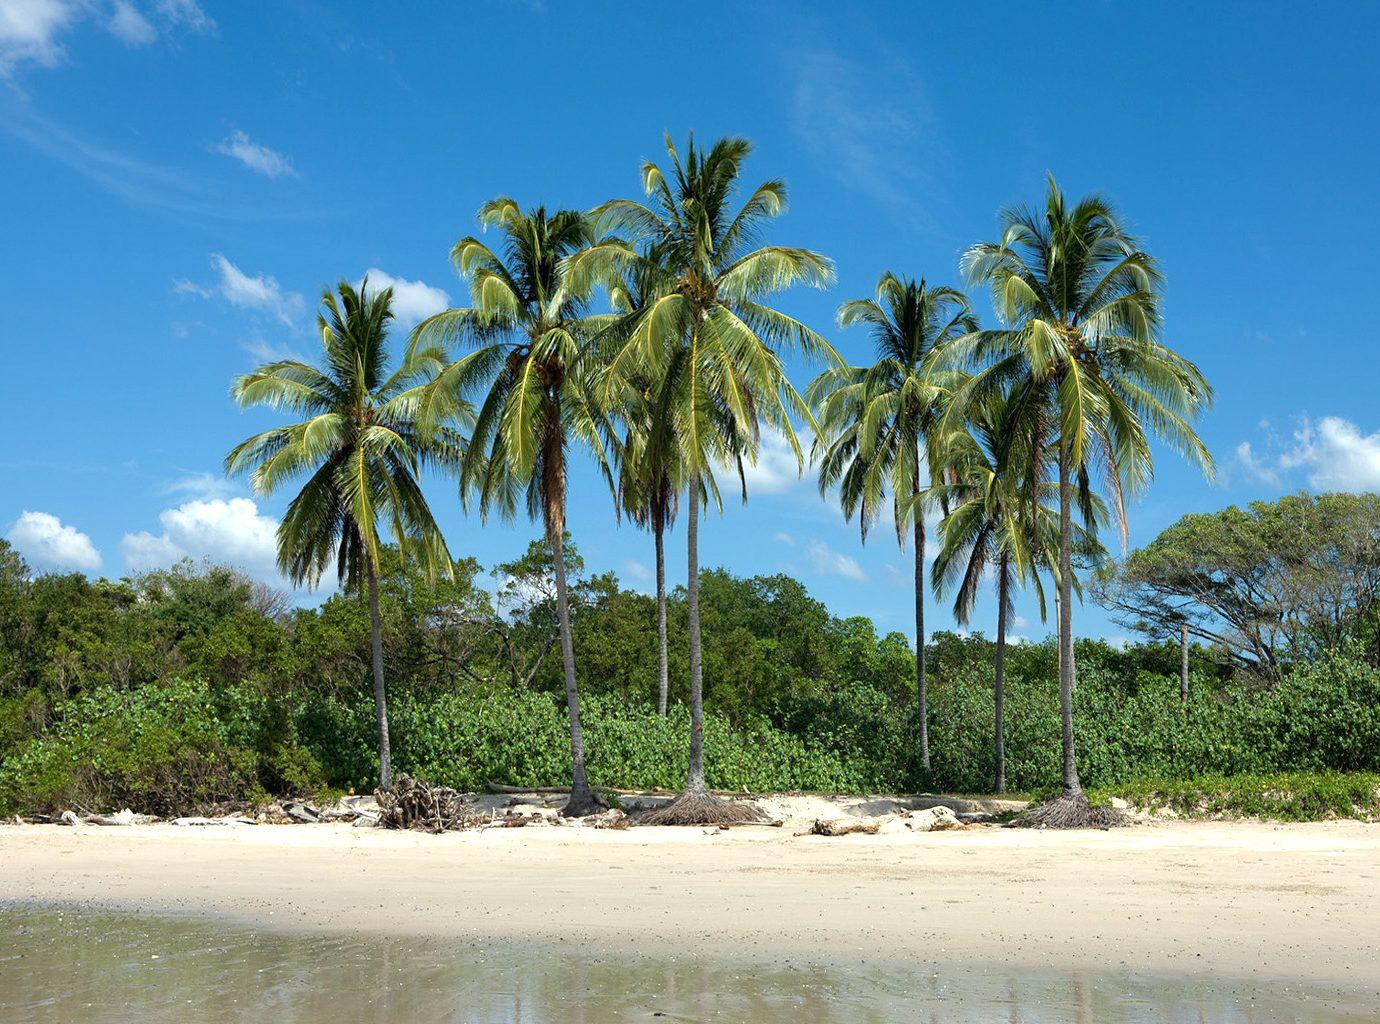 Beach at the Harmony Hotel in Costa Rica